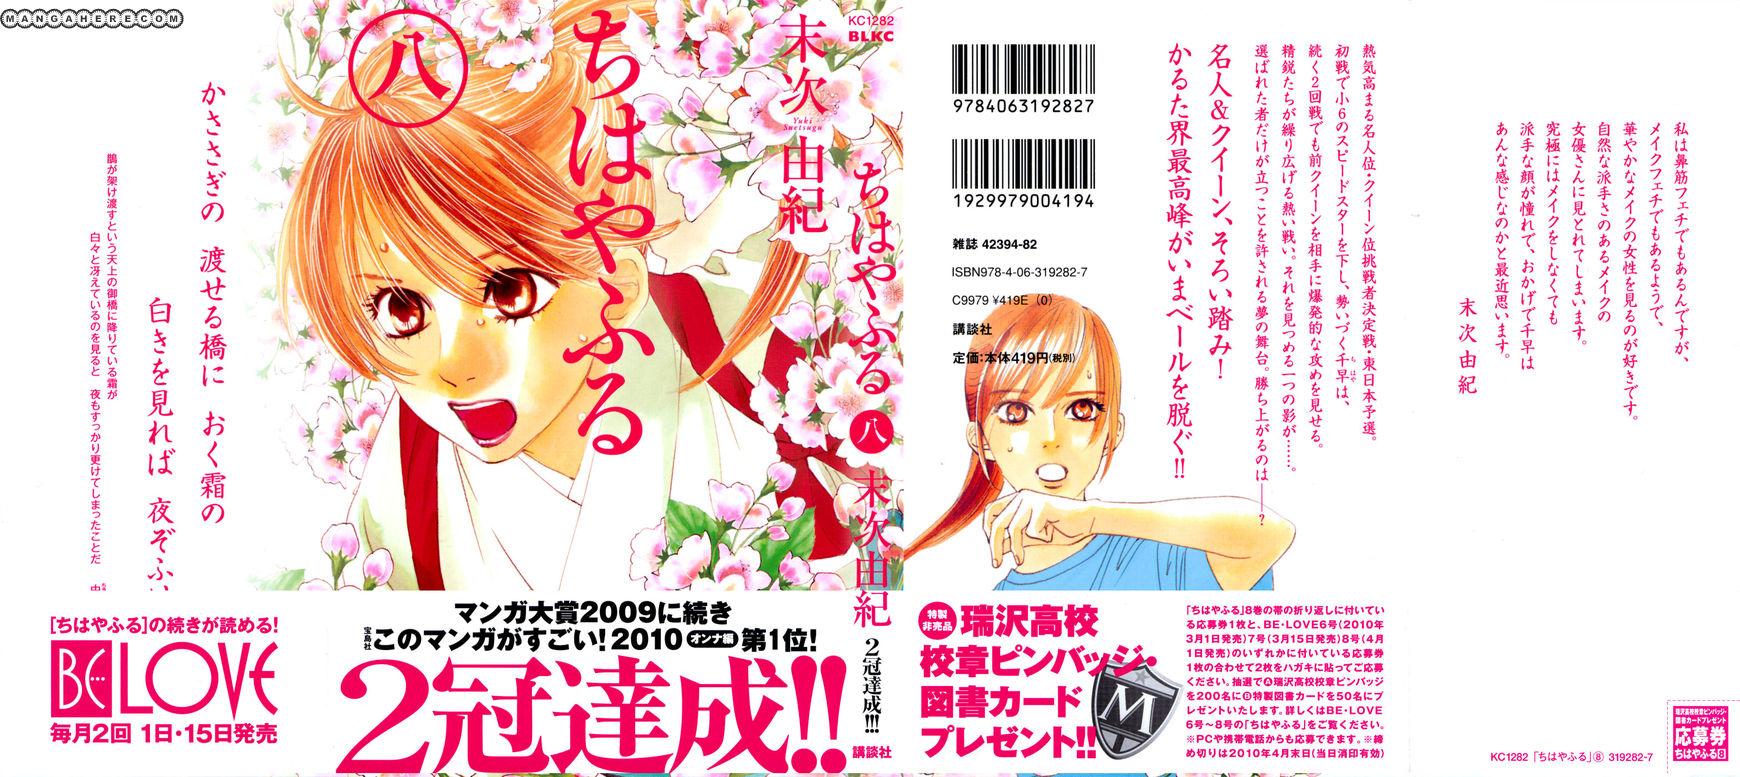 Chihayafuru 42 Page 1